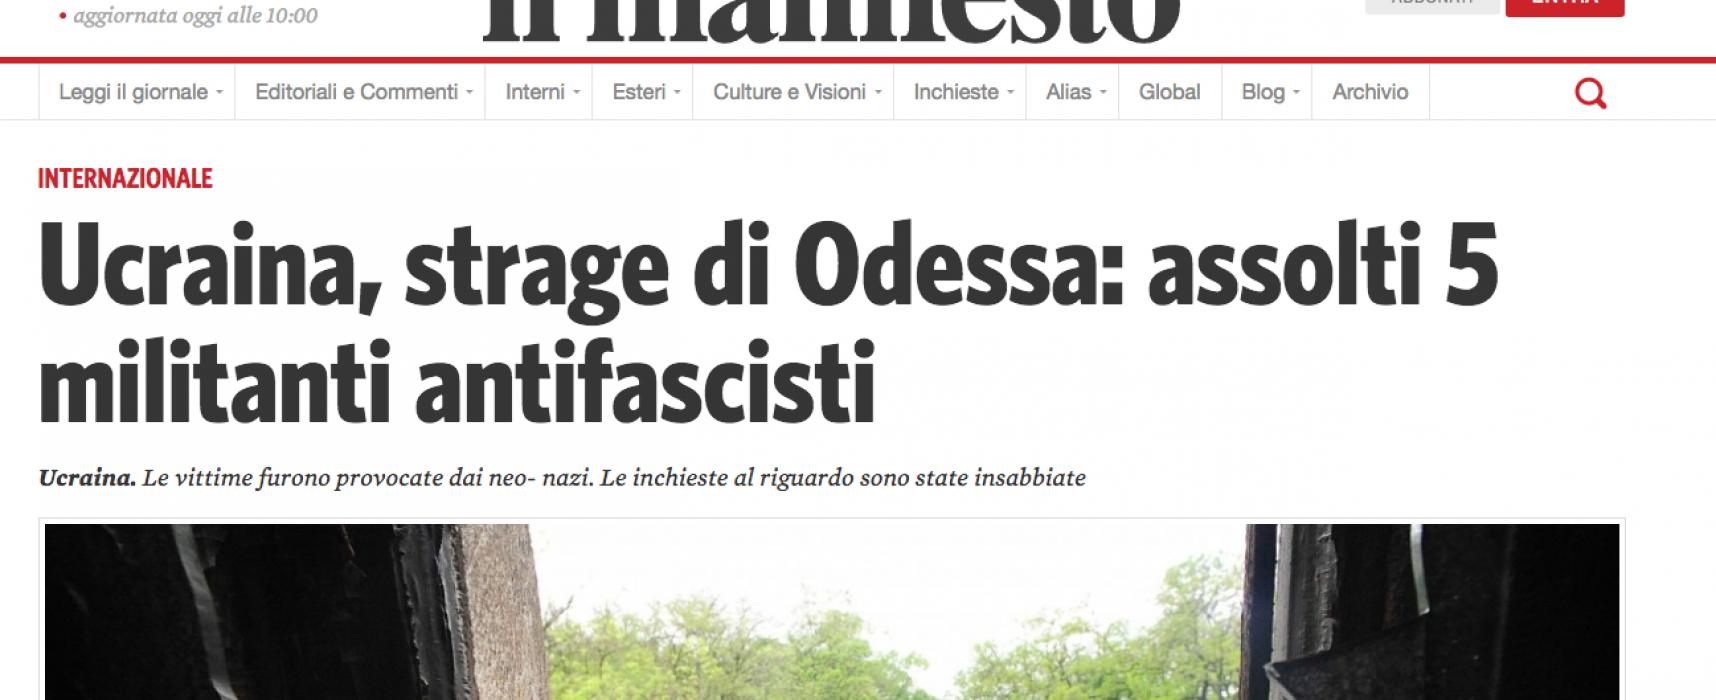 Fake del Manifesto : Insurrezioni anti fasciste in Ucraina